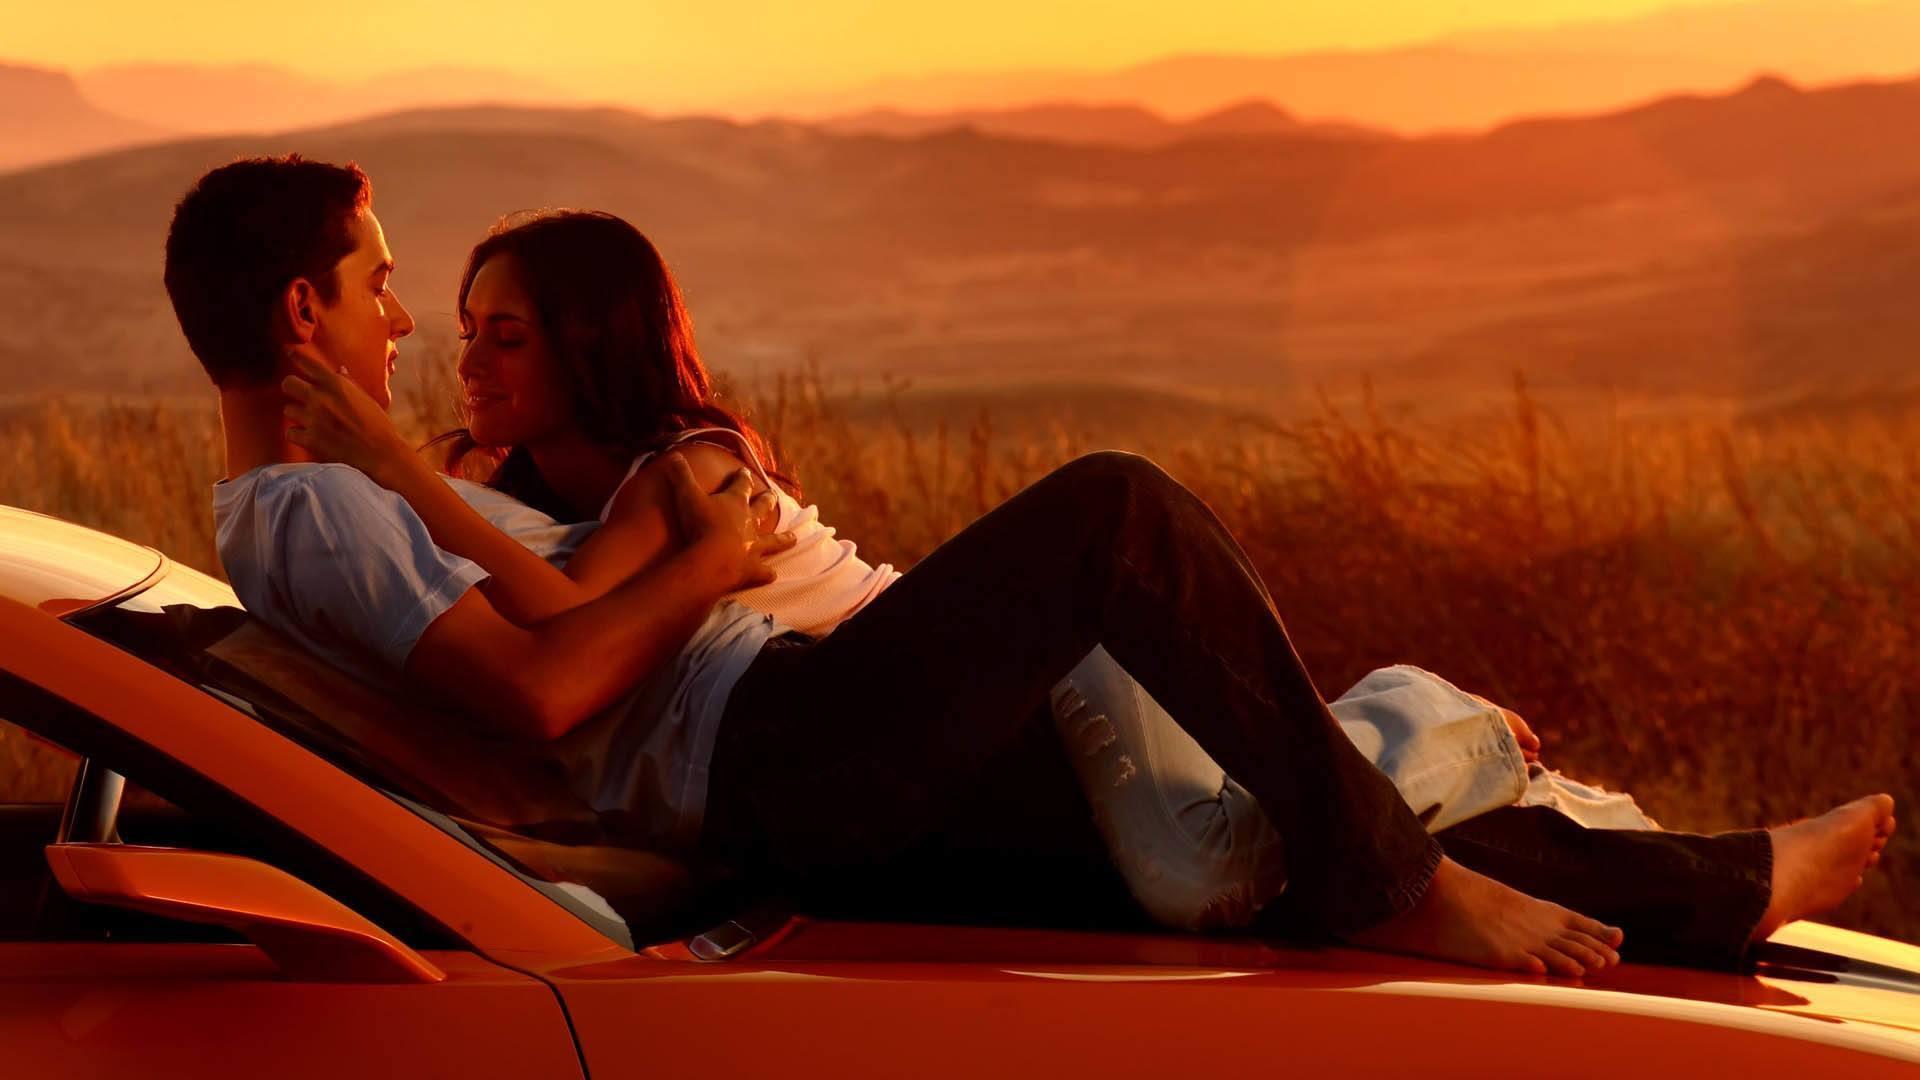 Couple-in-Love-On-Car-HD-Wallpaper